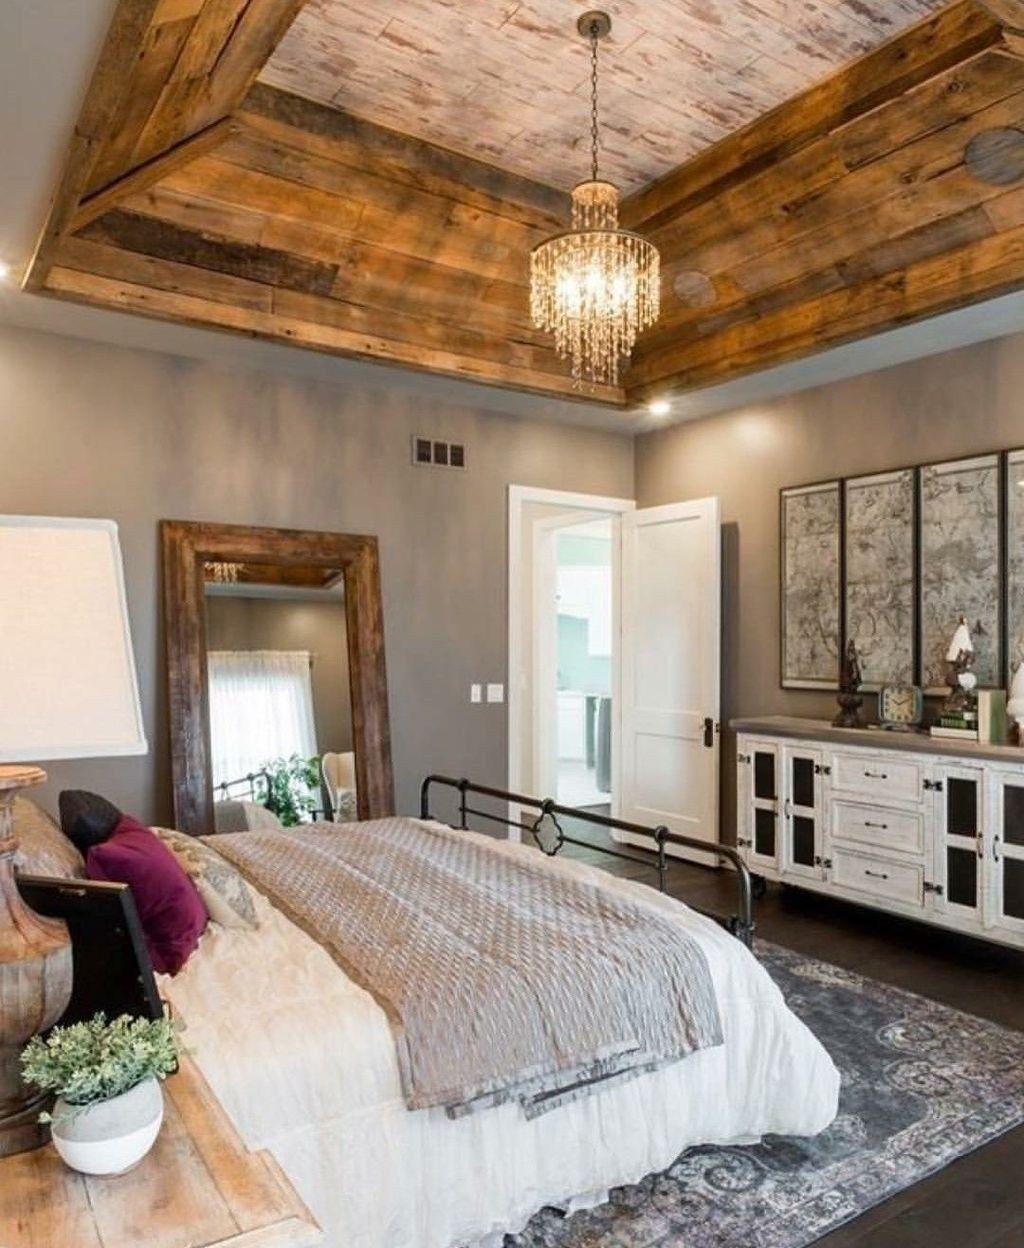 Modern single bedroom decorating ideas